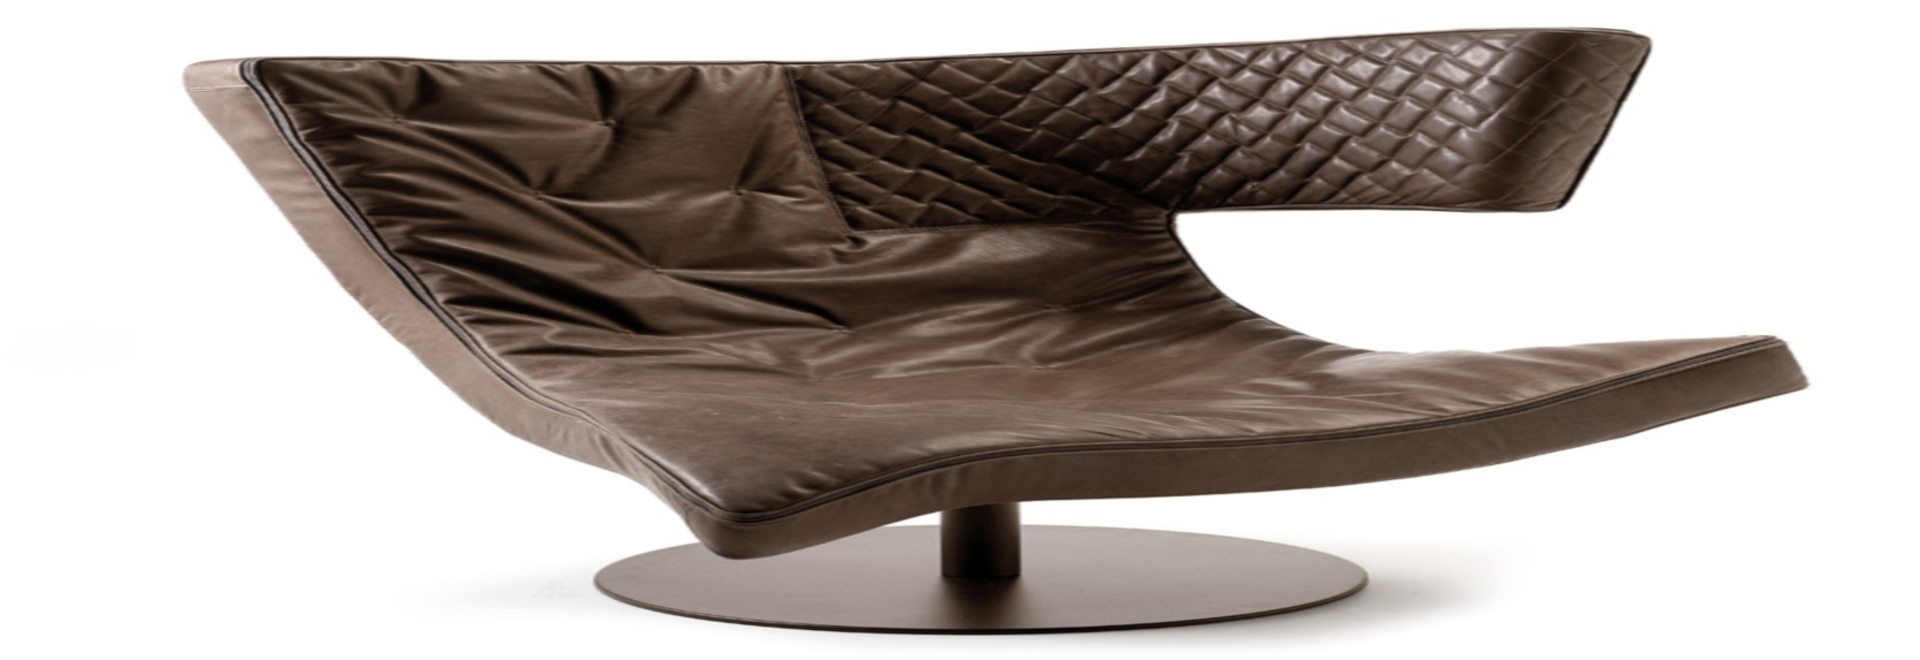 Superbe Arketipo Firenzeu0027s Haute Couture Furniture Embraces Italian Heritage,  Authentic Design + Functionality